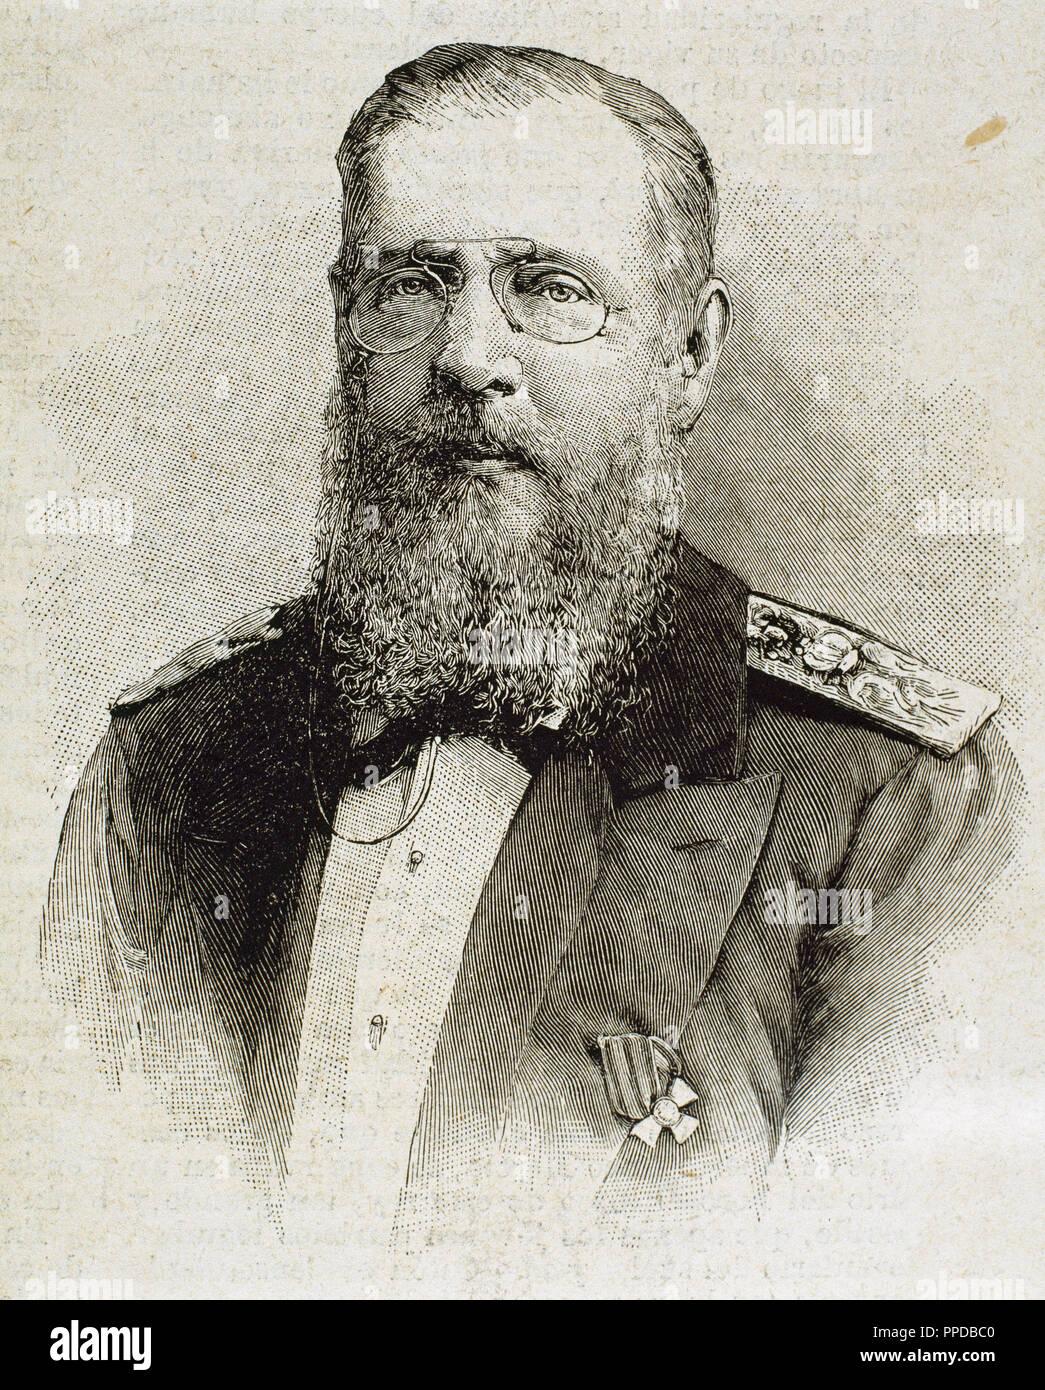 Alexander Ii NikolaevichStock Photos and Images